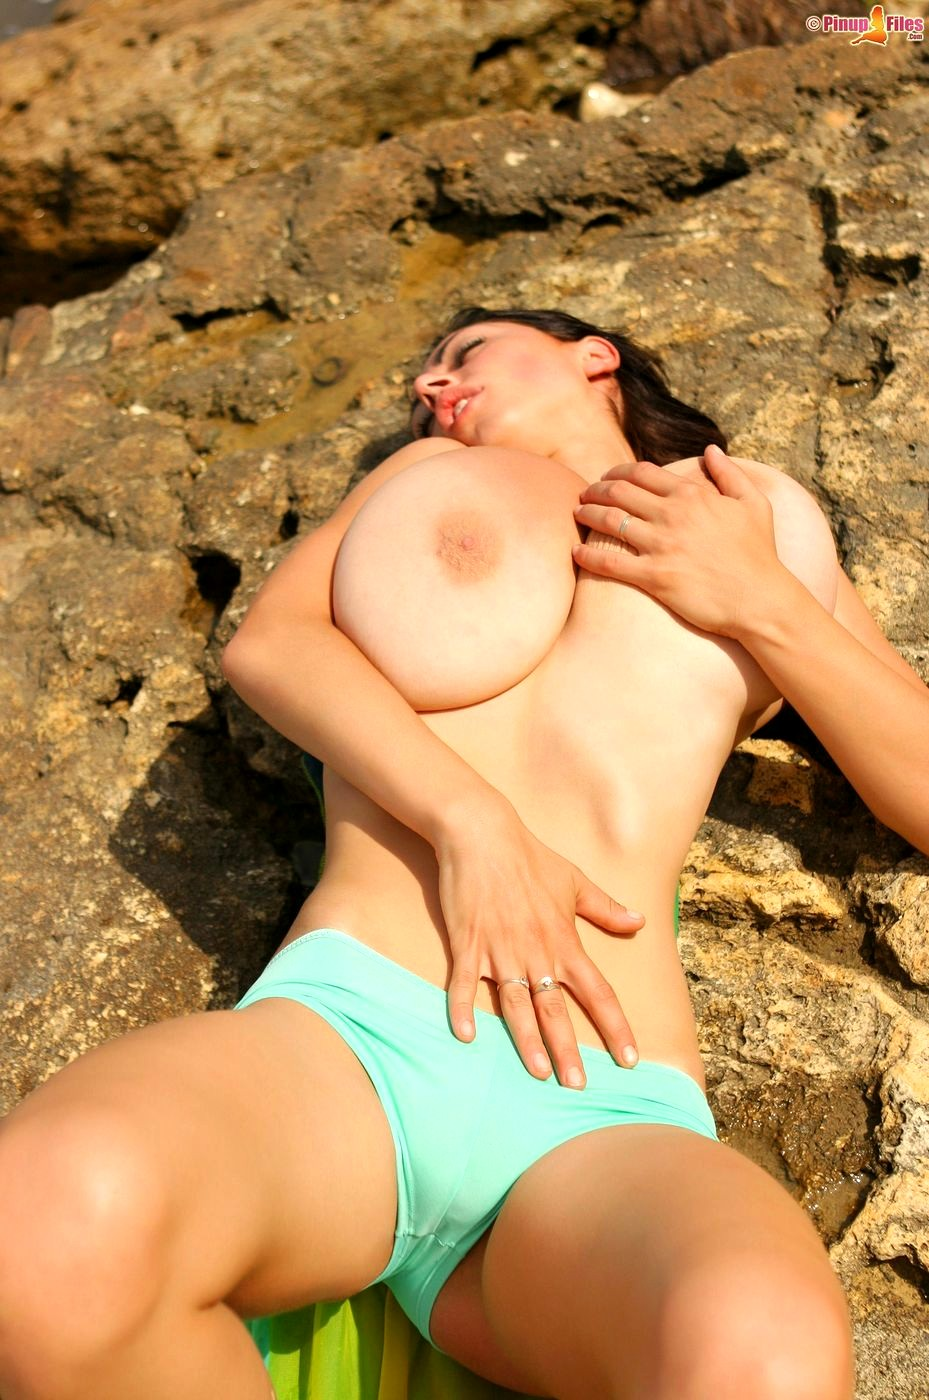 Merilyn sakova nude pics, pics, and links